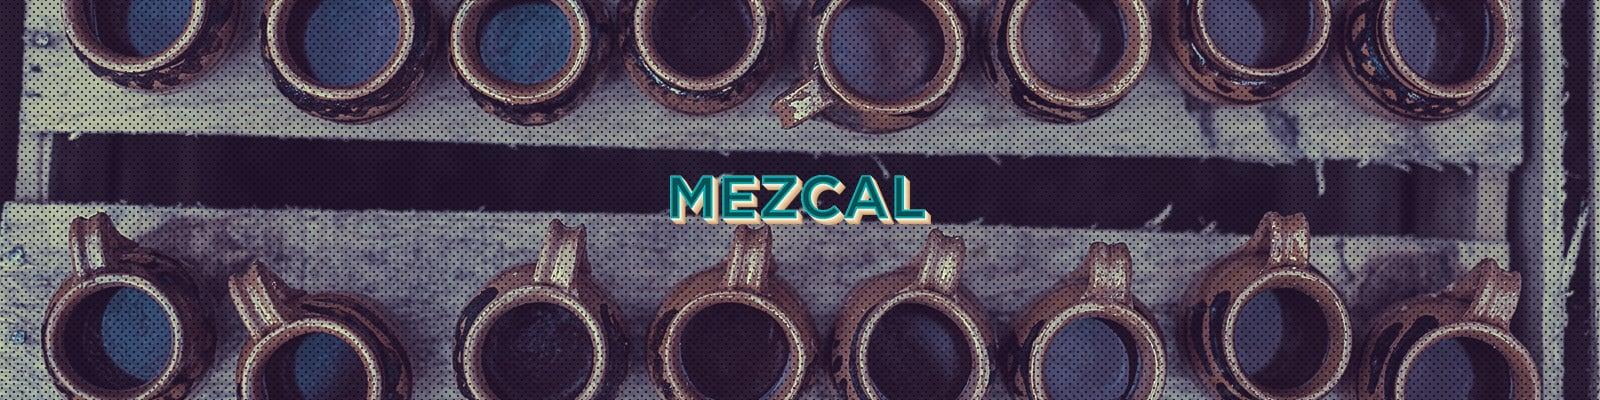 Mezcal - Other - Spirits - Caskers